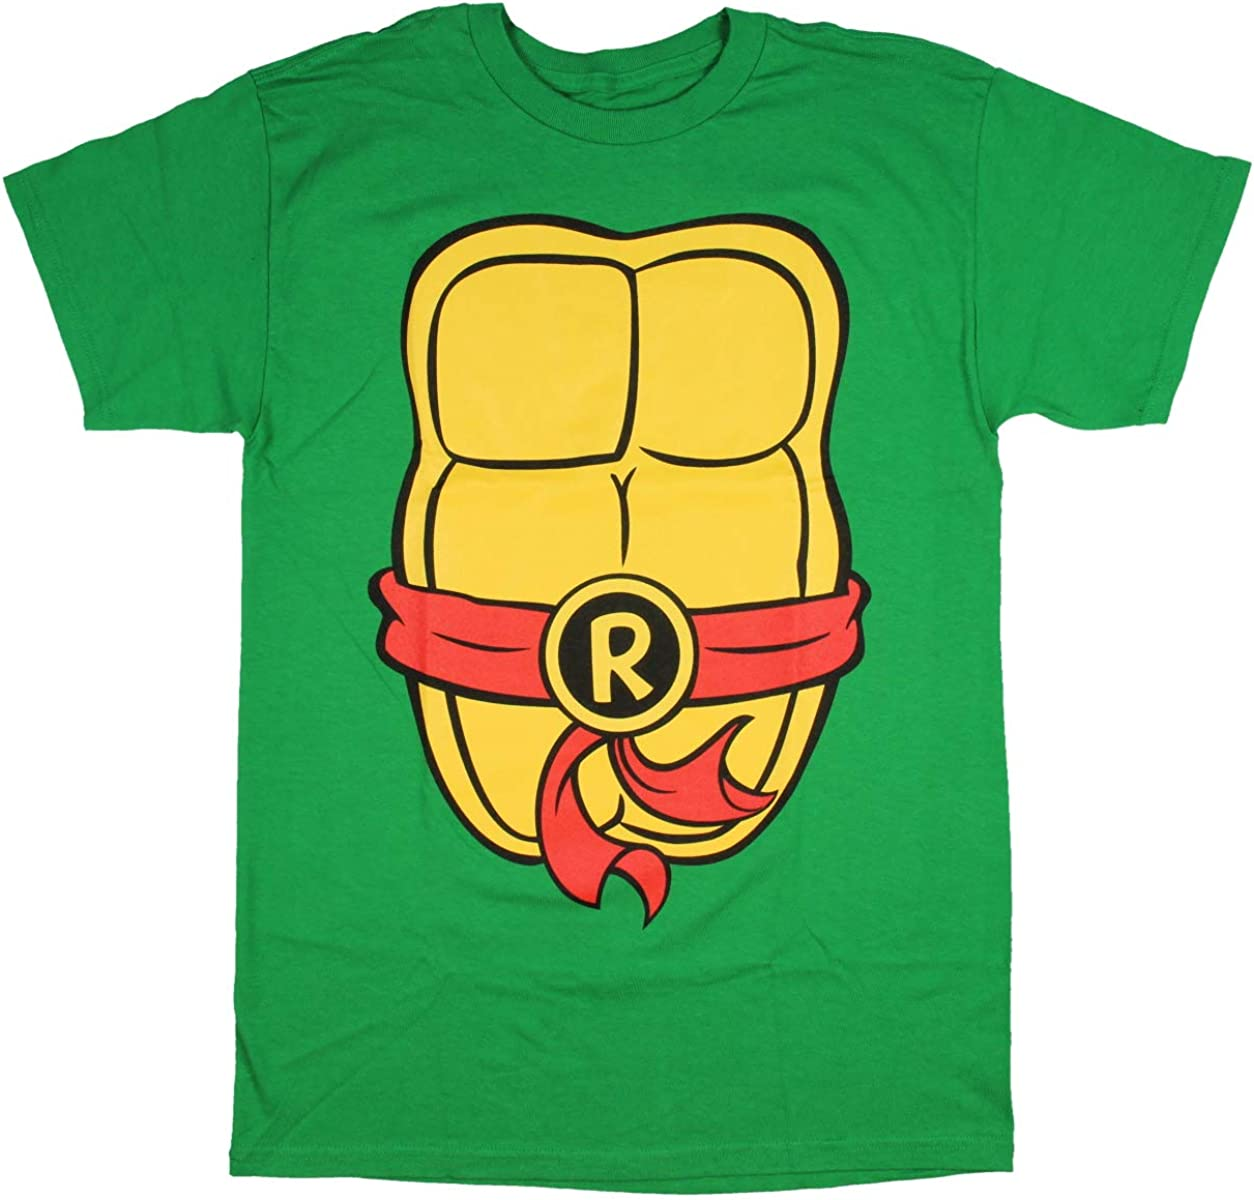 Amazon.com: Adolescente Mutante Tortugas Ninja Camiseta para ...